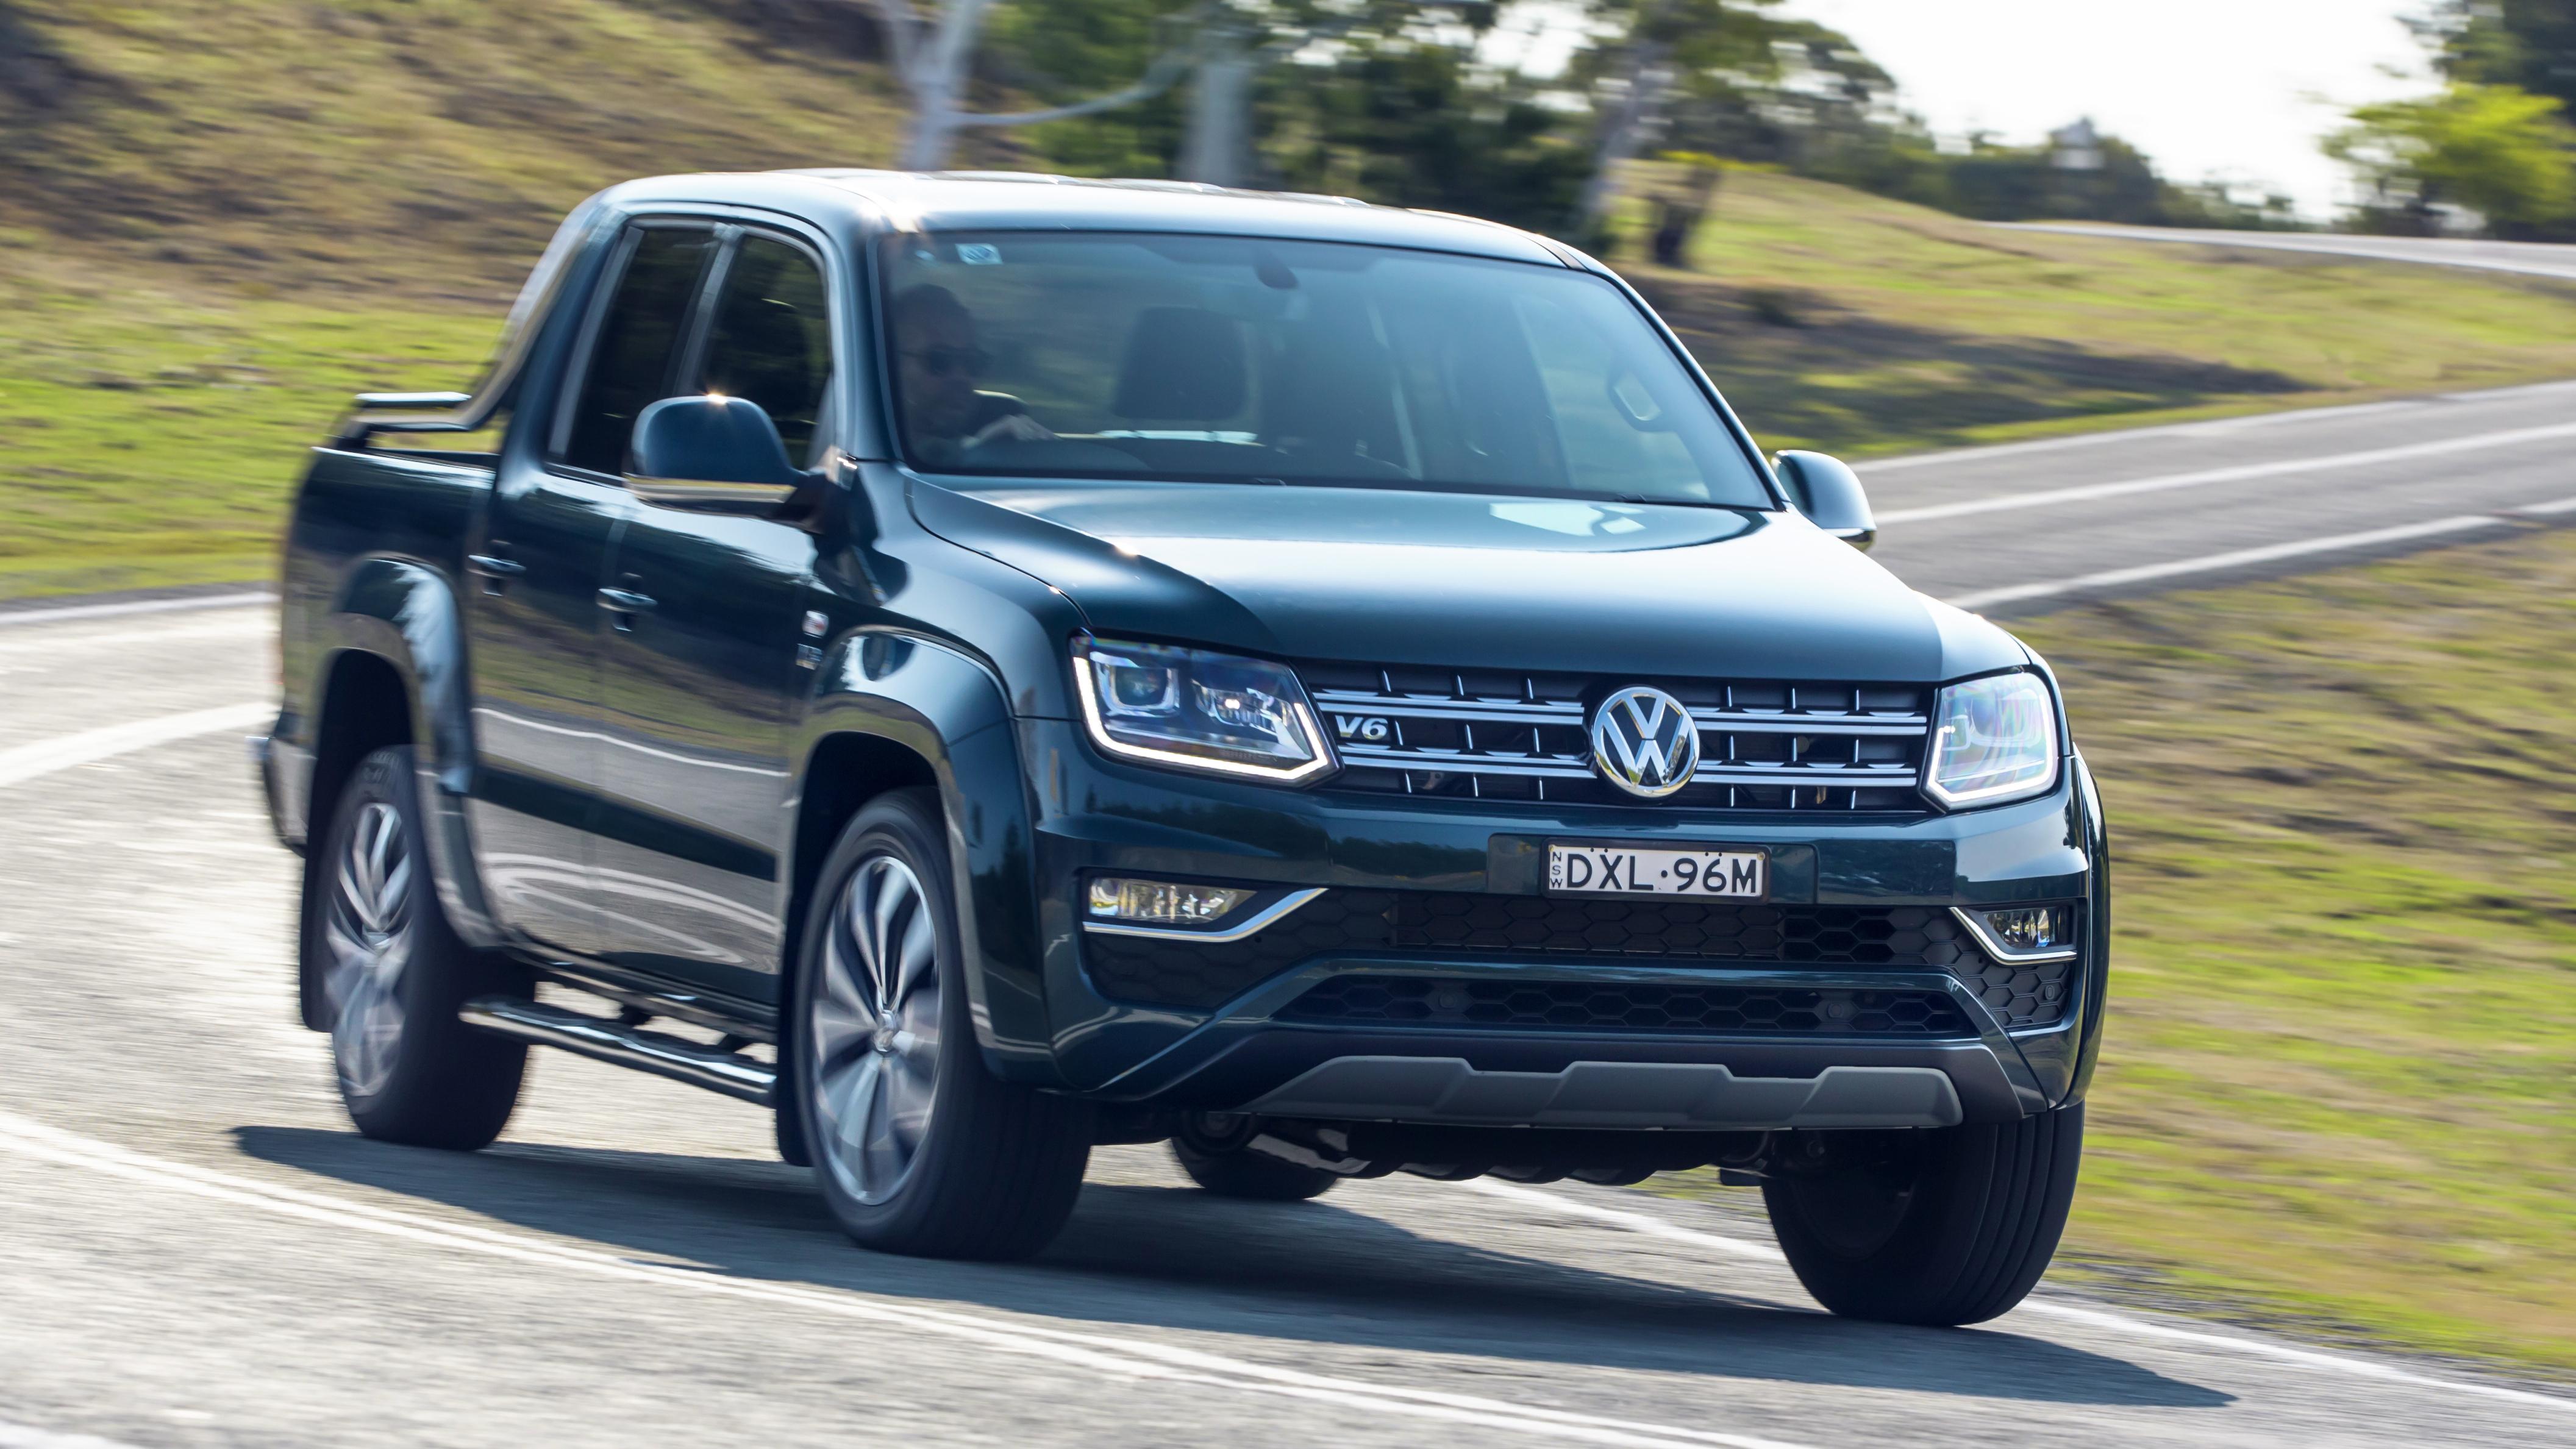 2019 Volkswagen Amarok V6 Ultimate 580 review | CarAdvice